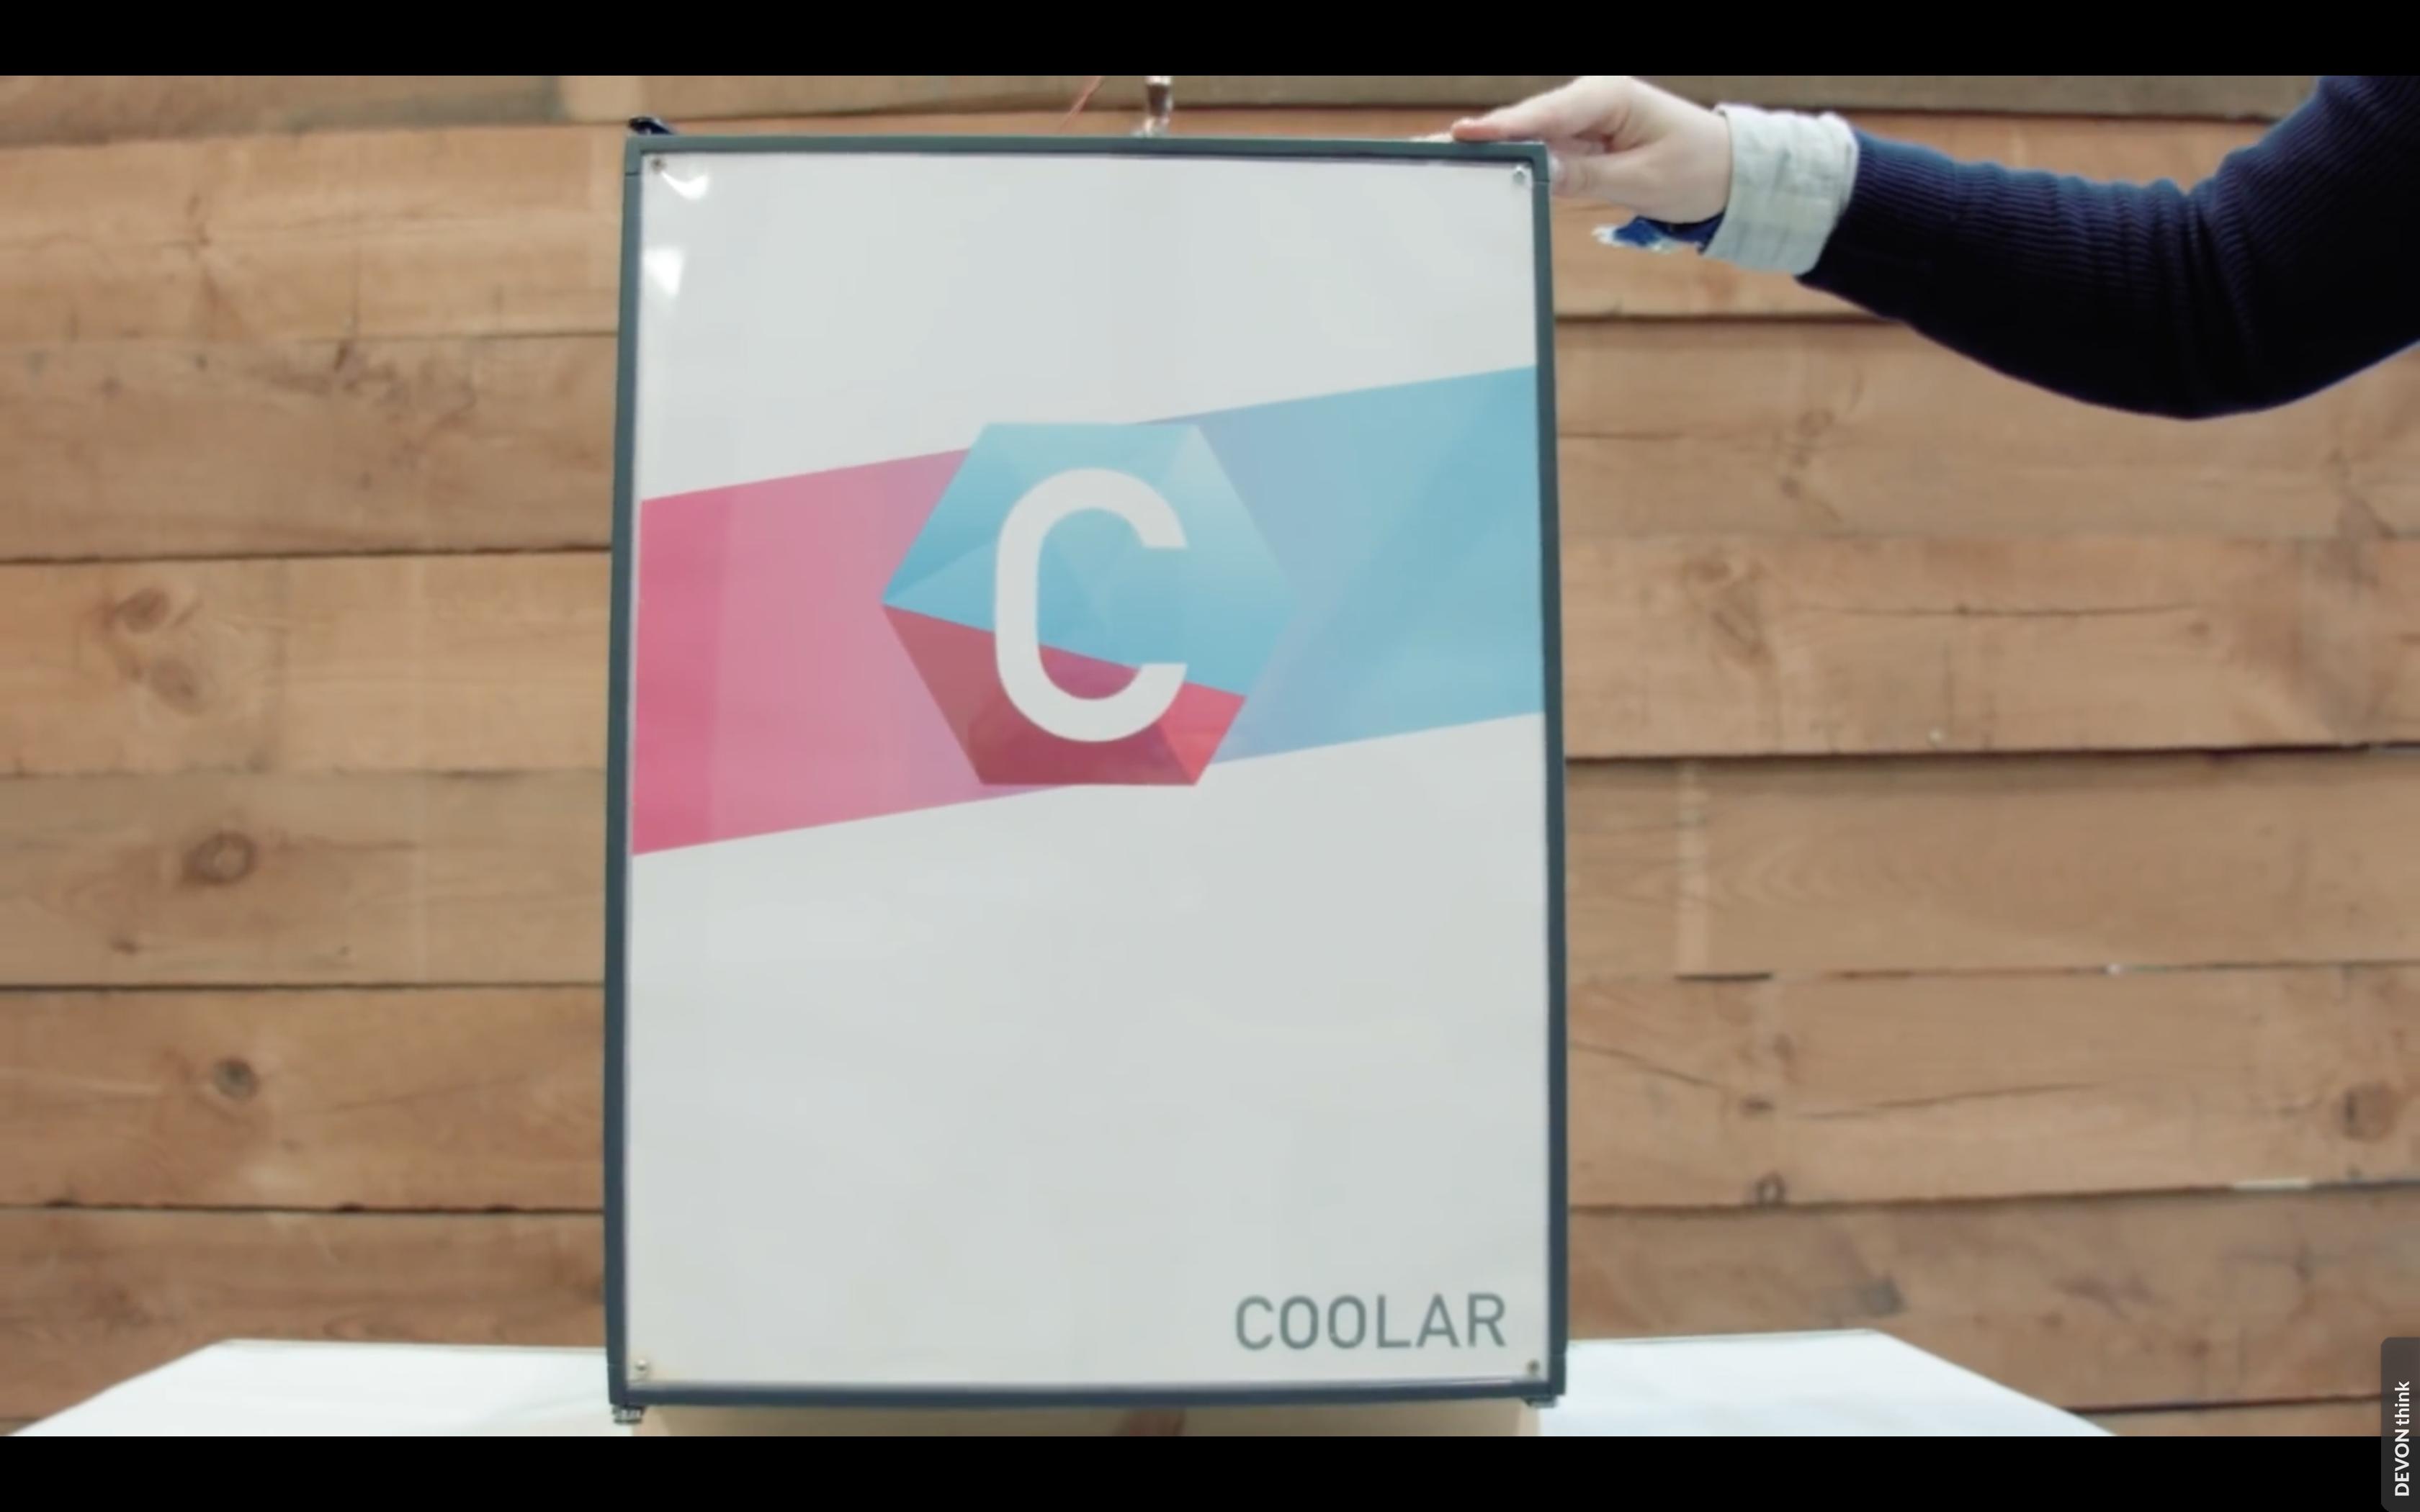 Coolar © Coolar GbR 2015